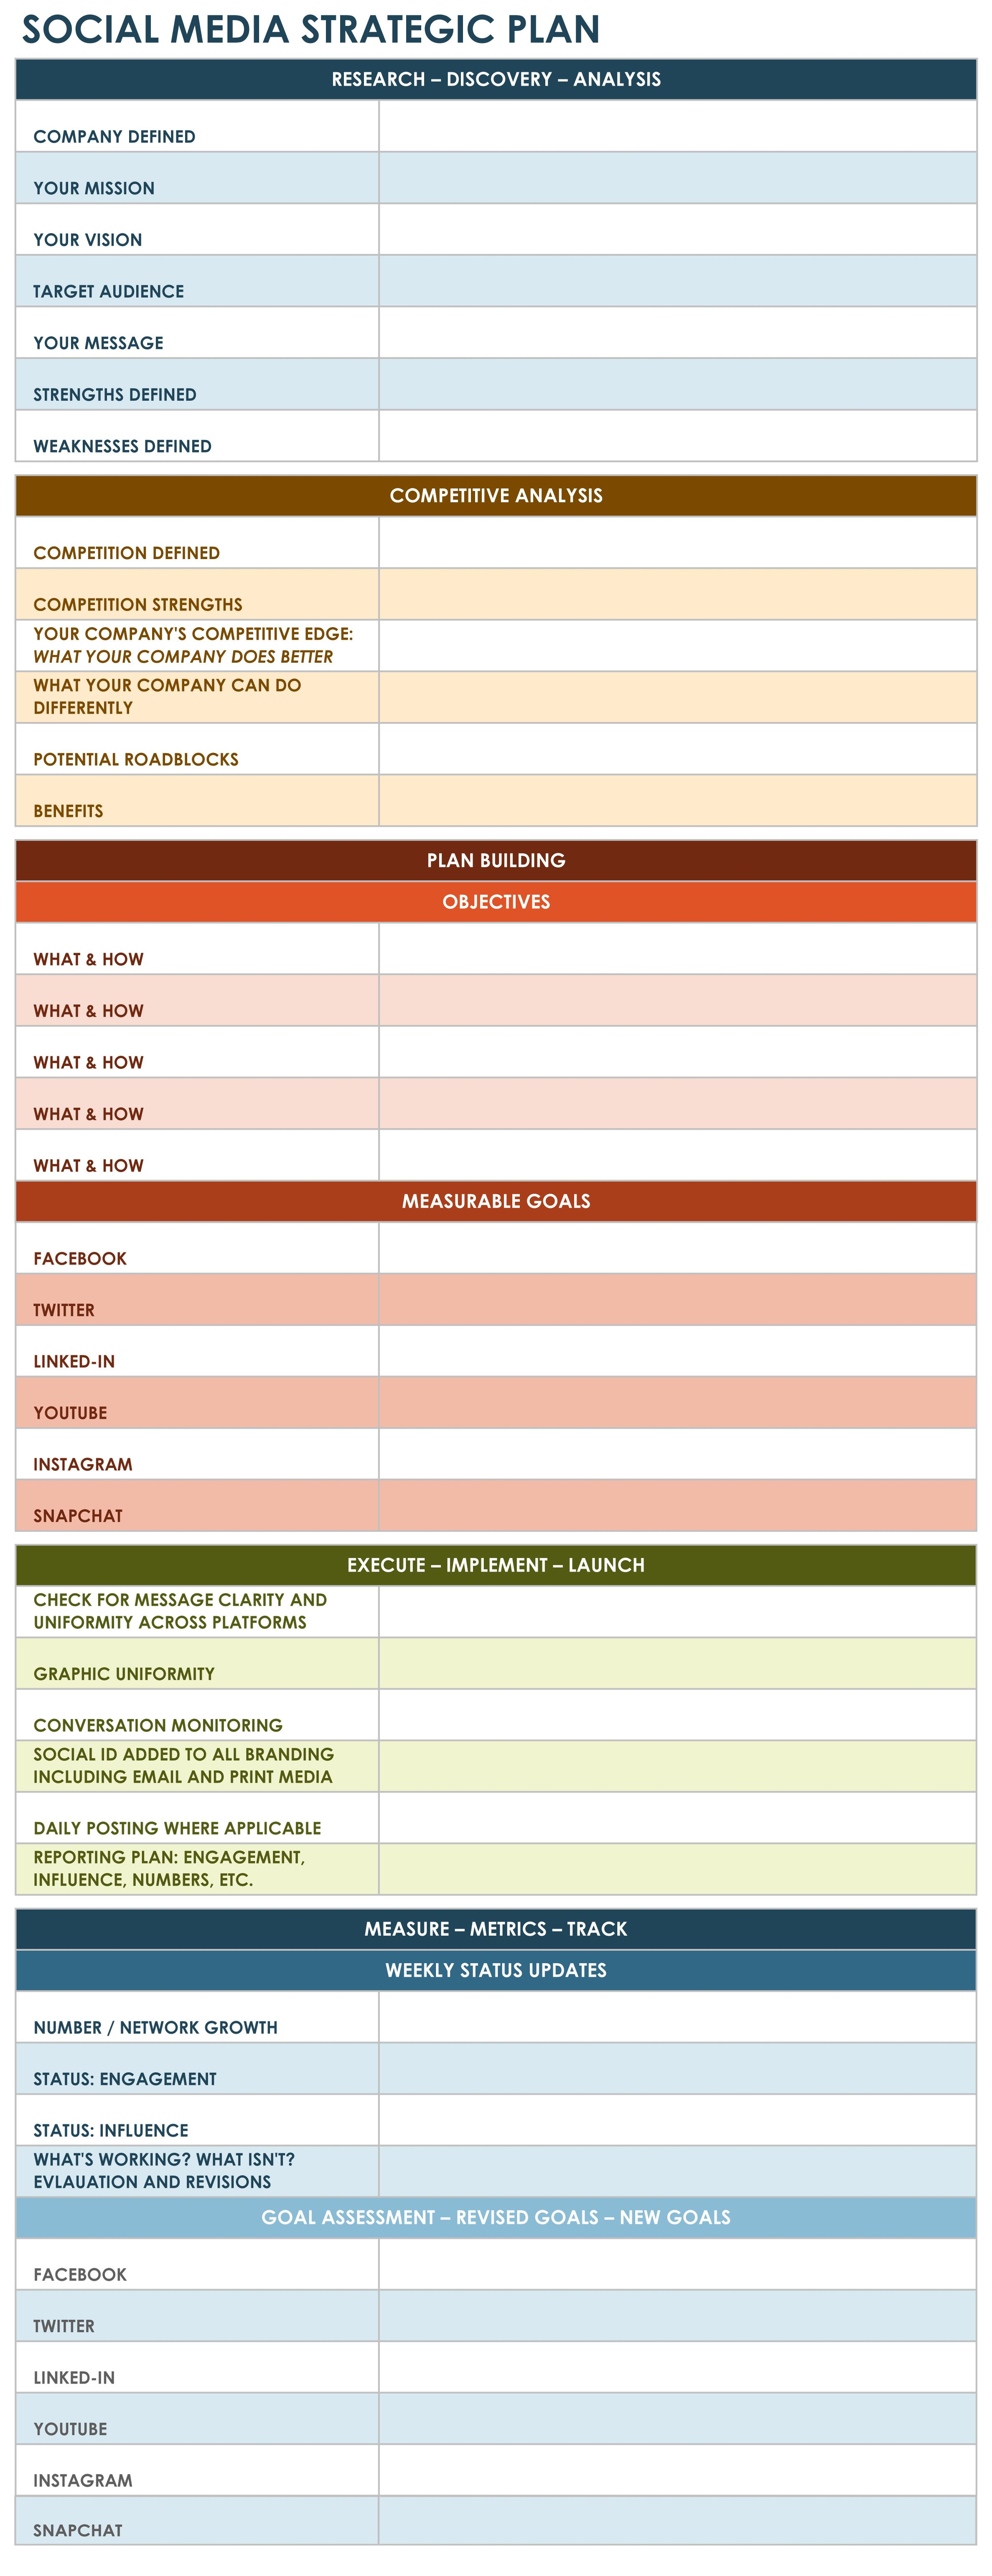 Social Media Strategic Plan Excel Template